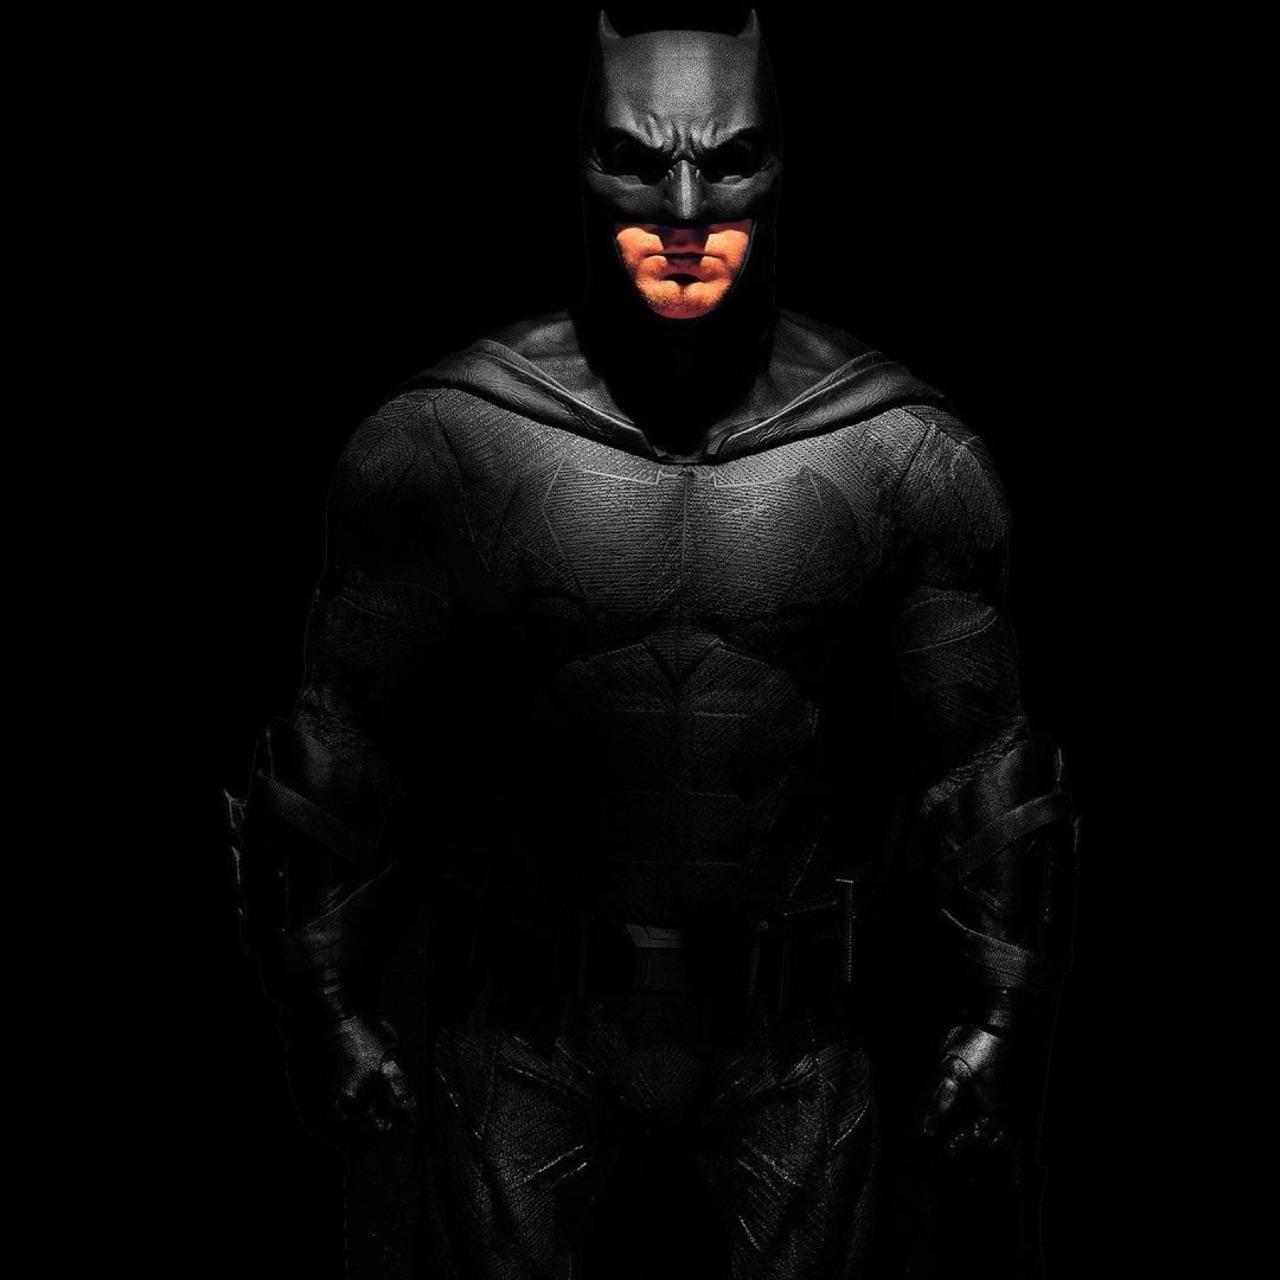 Ben Affleck, frank miller, and the batman image